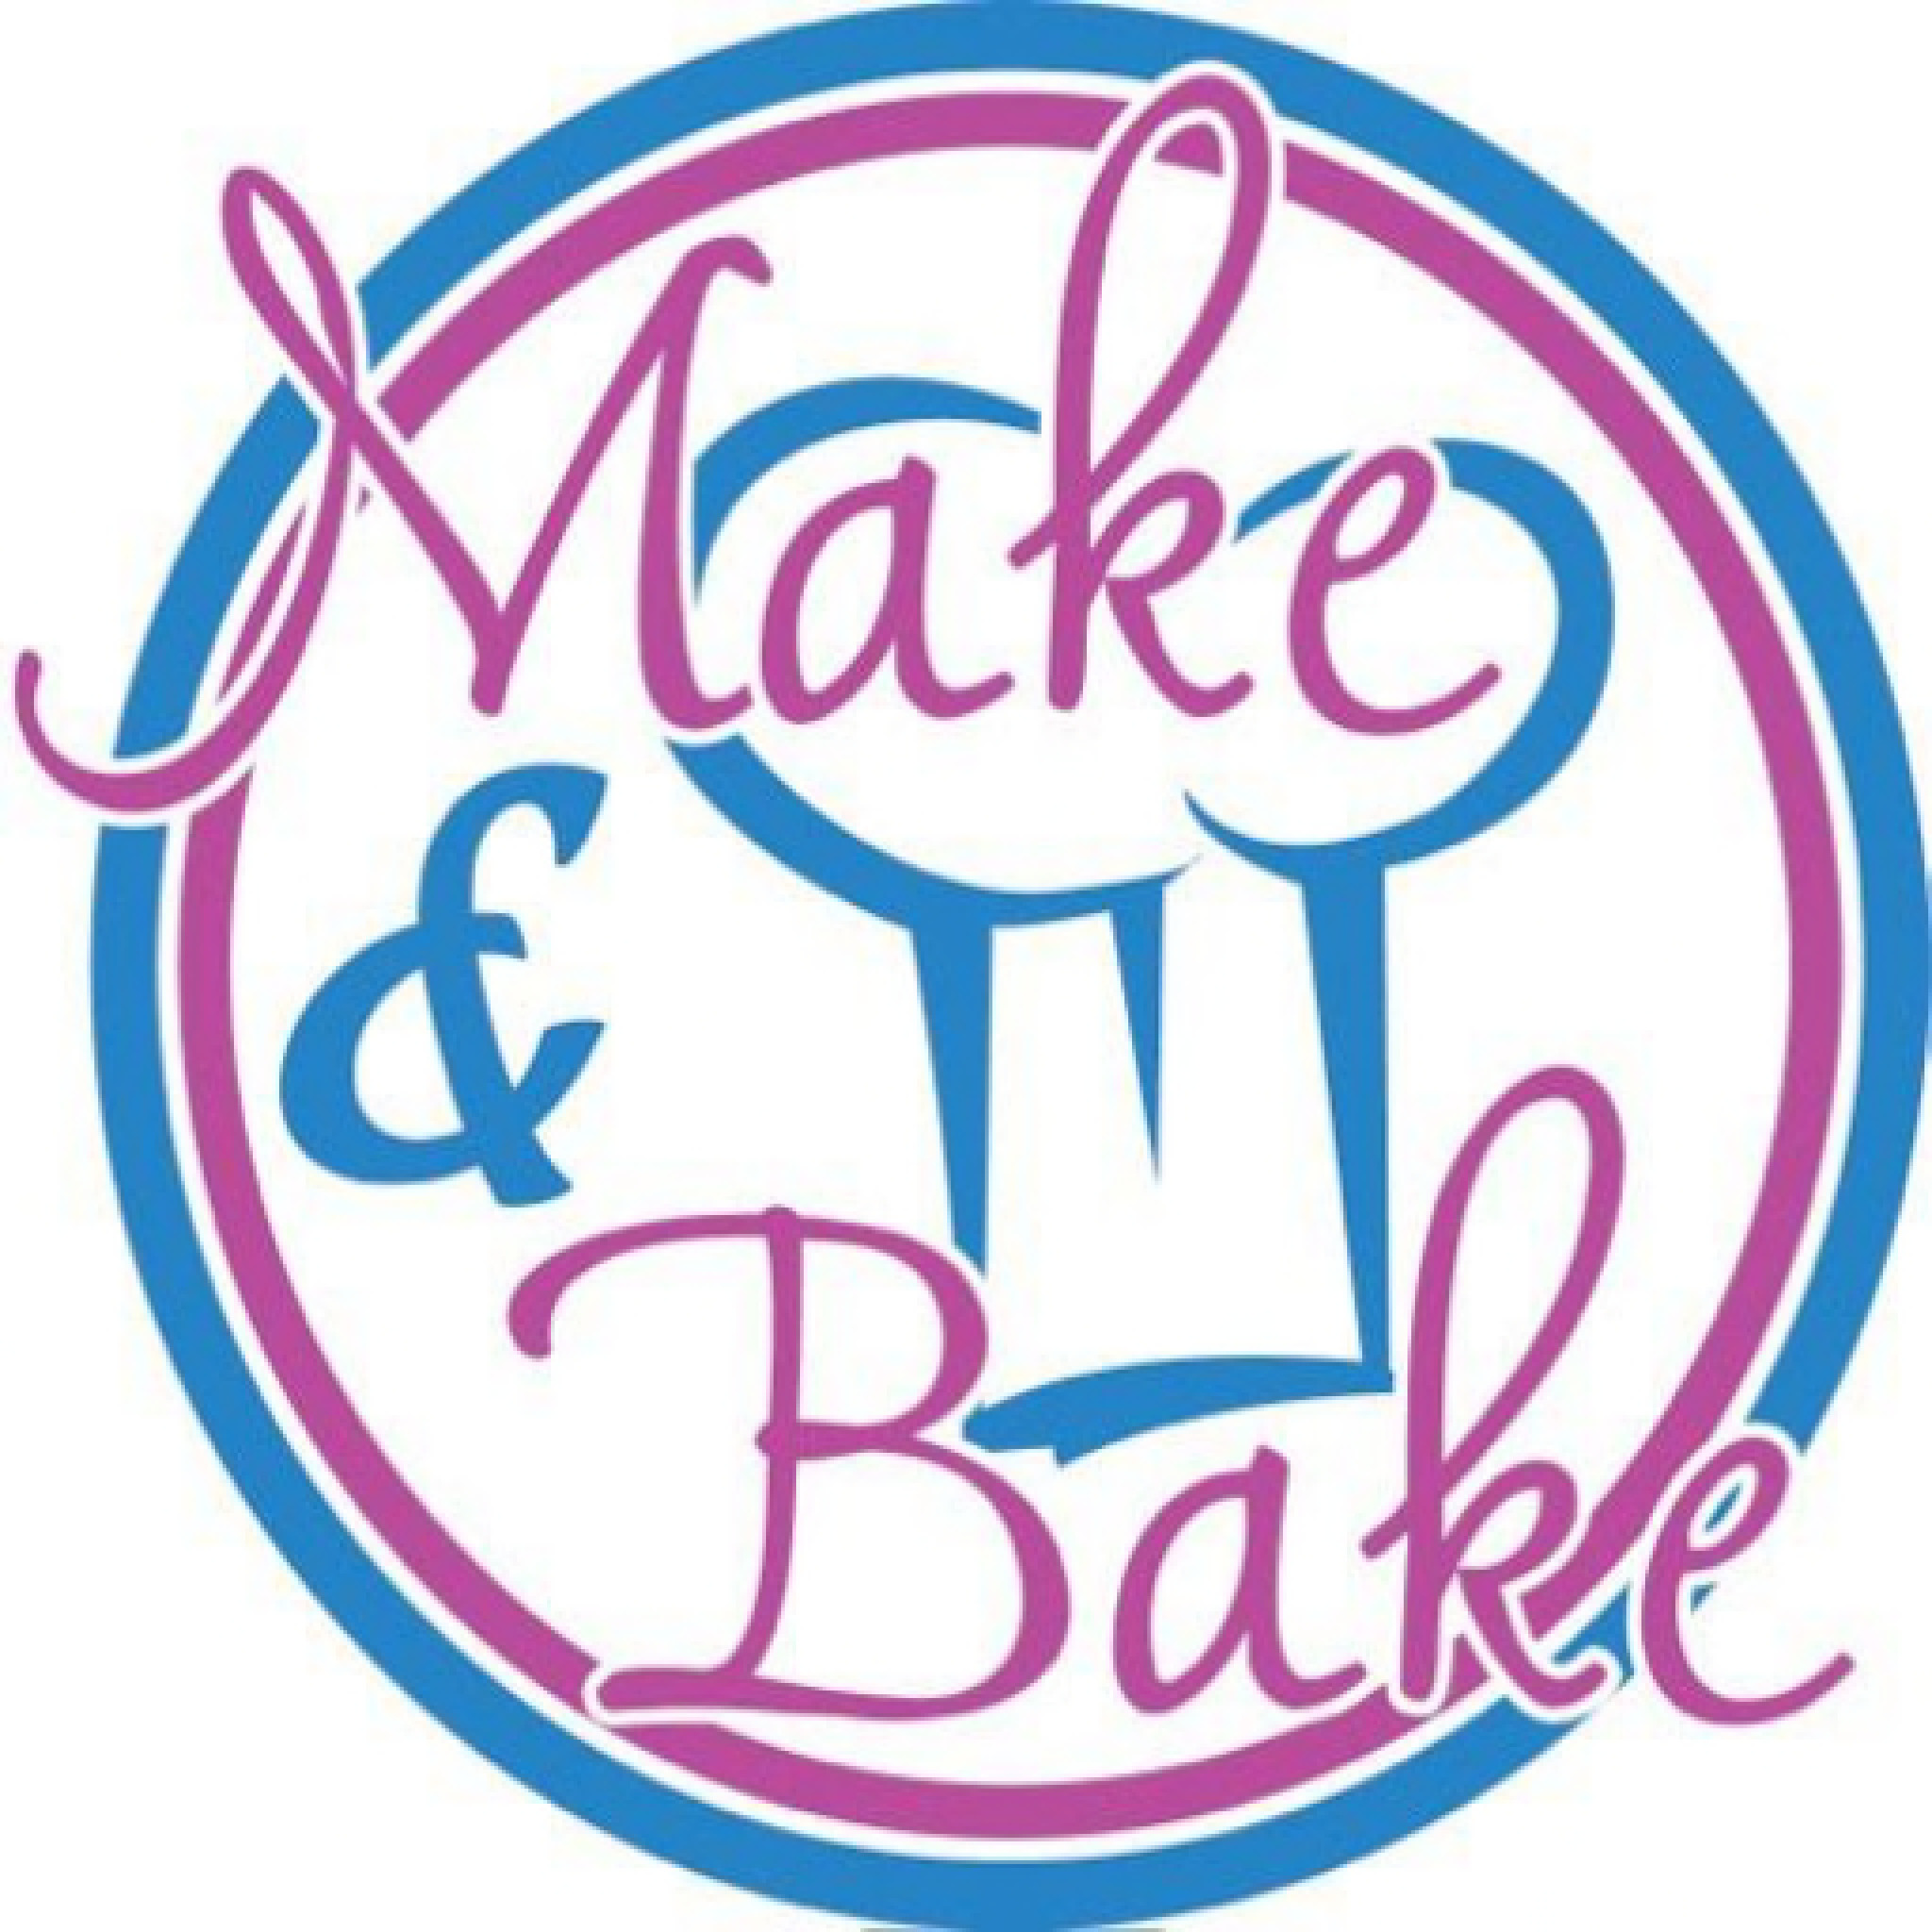 Make & Bake Market